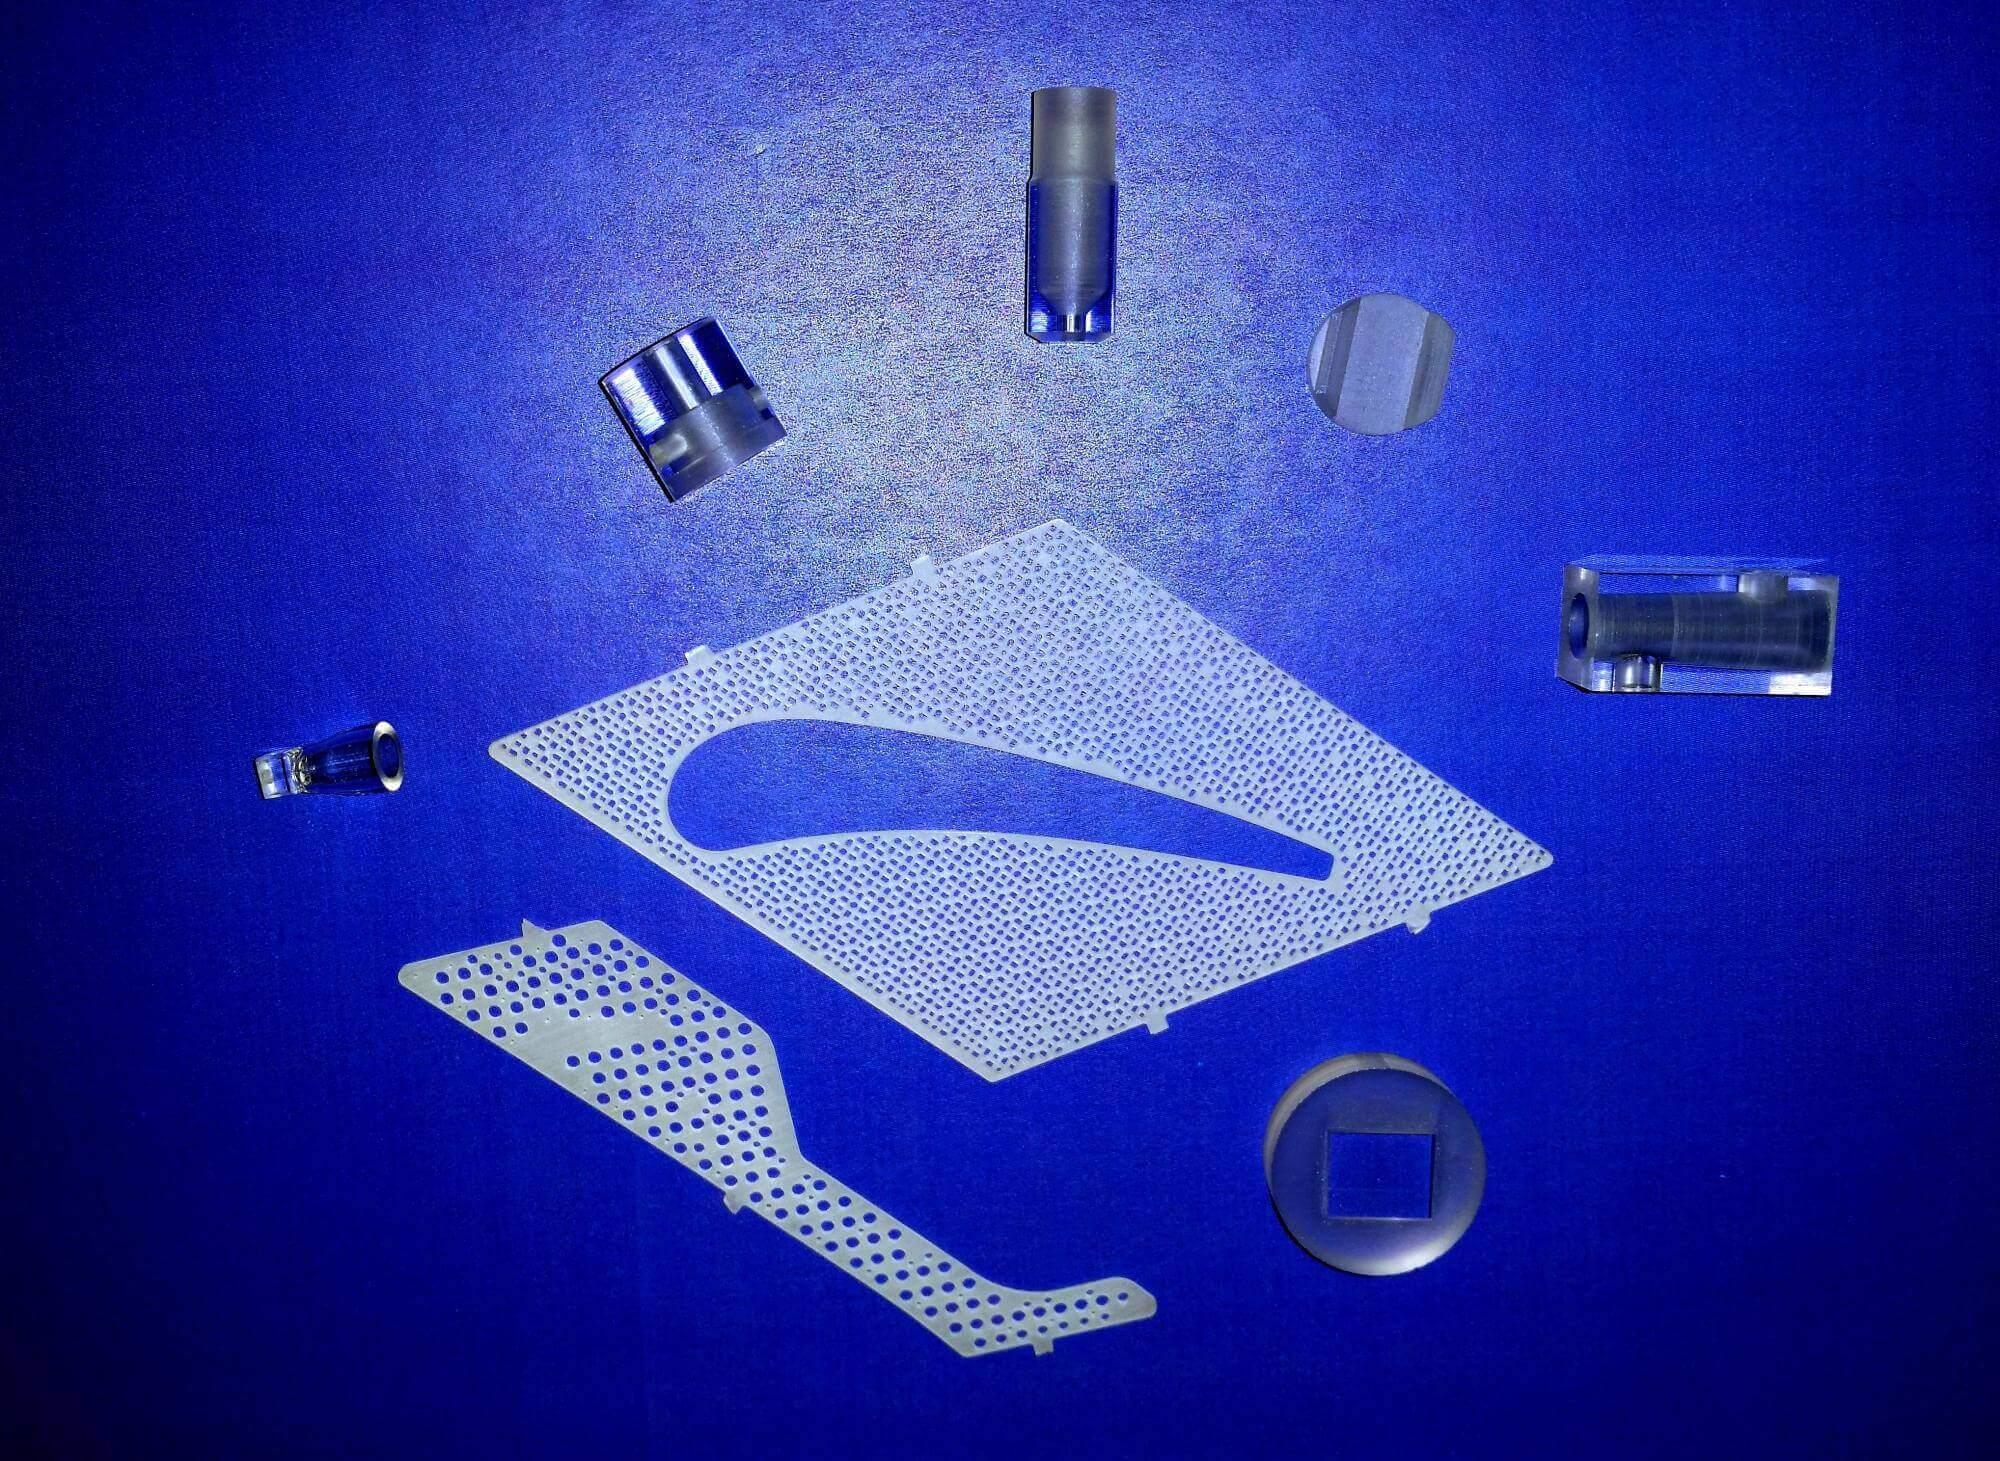 CNC Machining & Laser Cutting of Glass or Quartz Parts